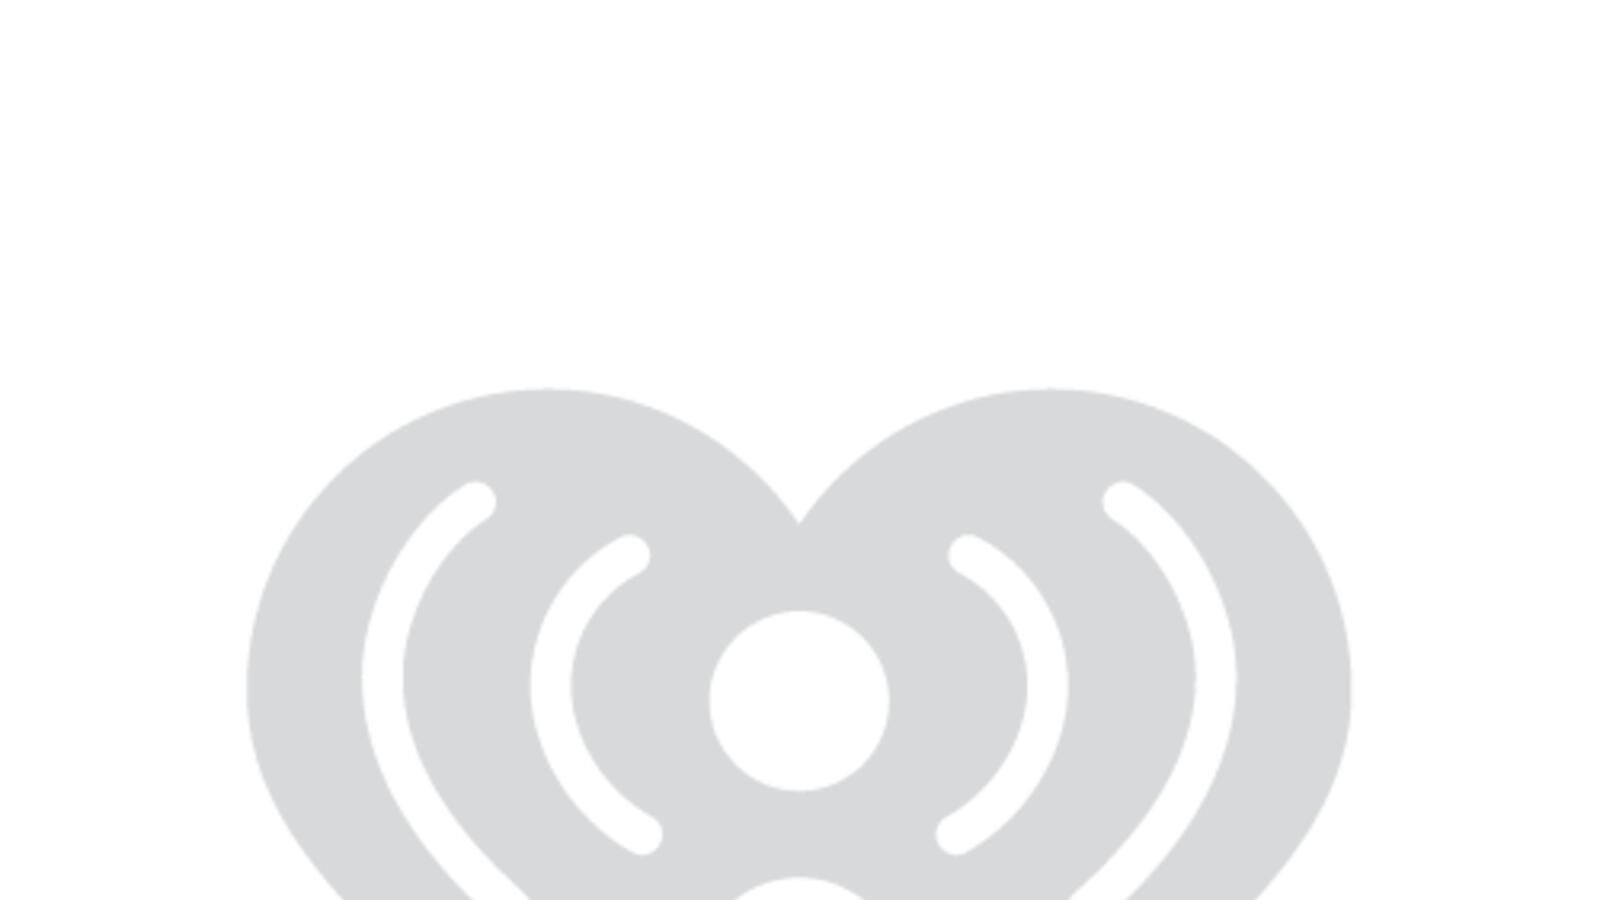 Rod Arquette Show Daily Rundown - Thursday, October 21, 2021